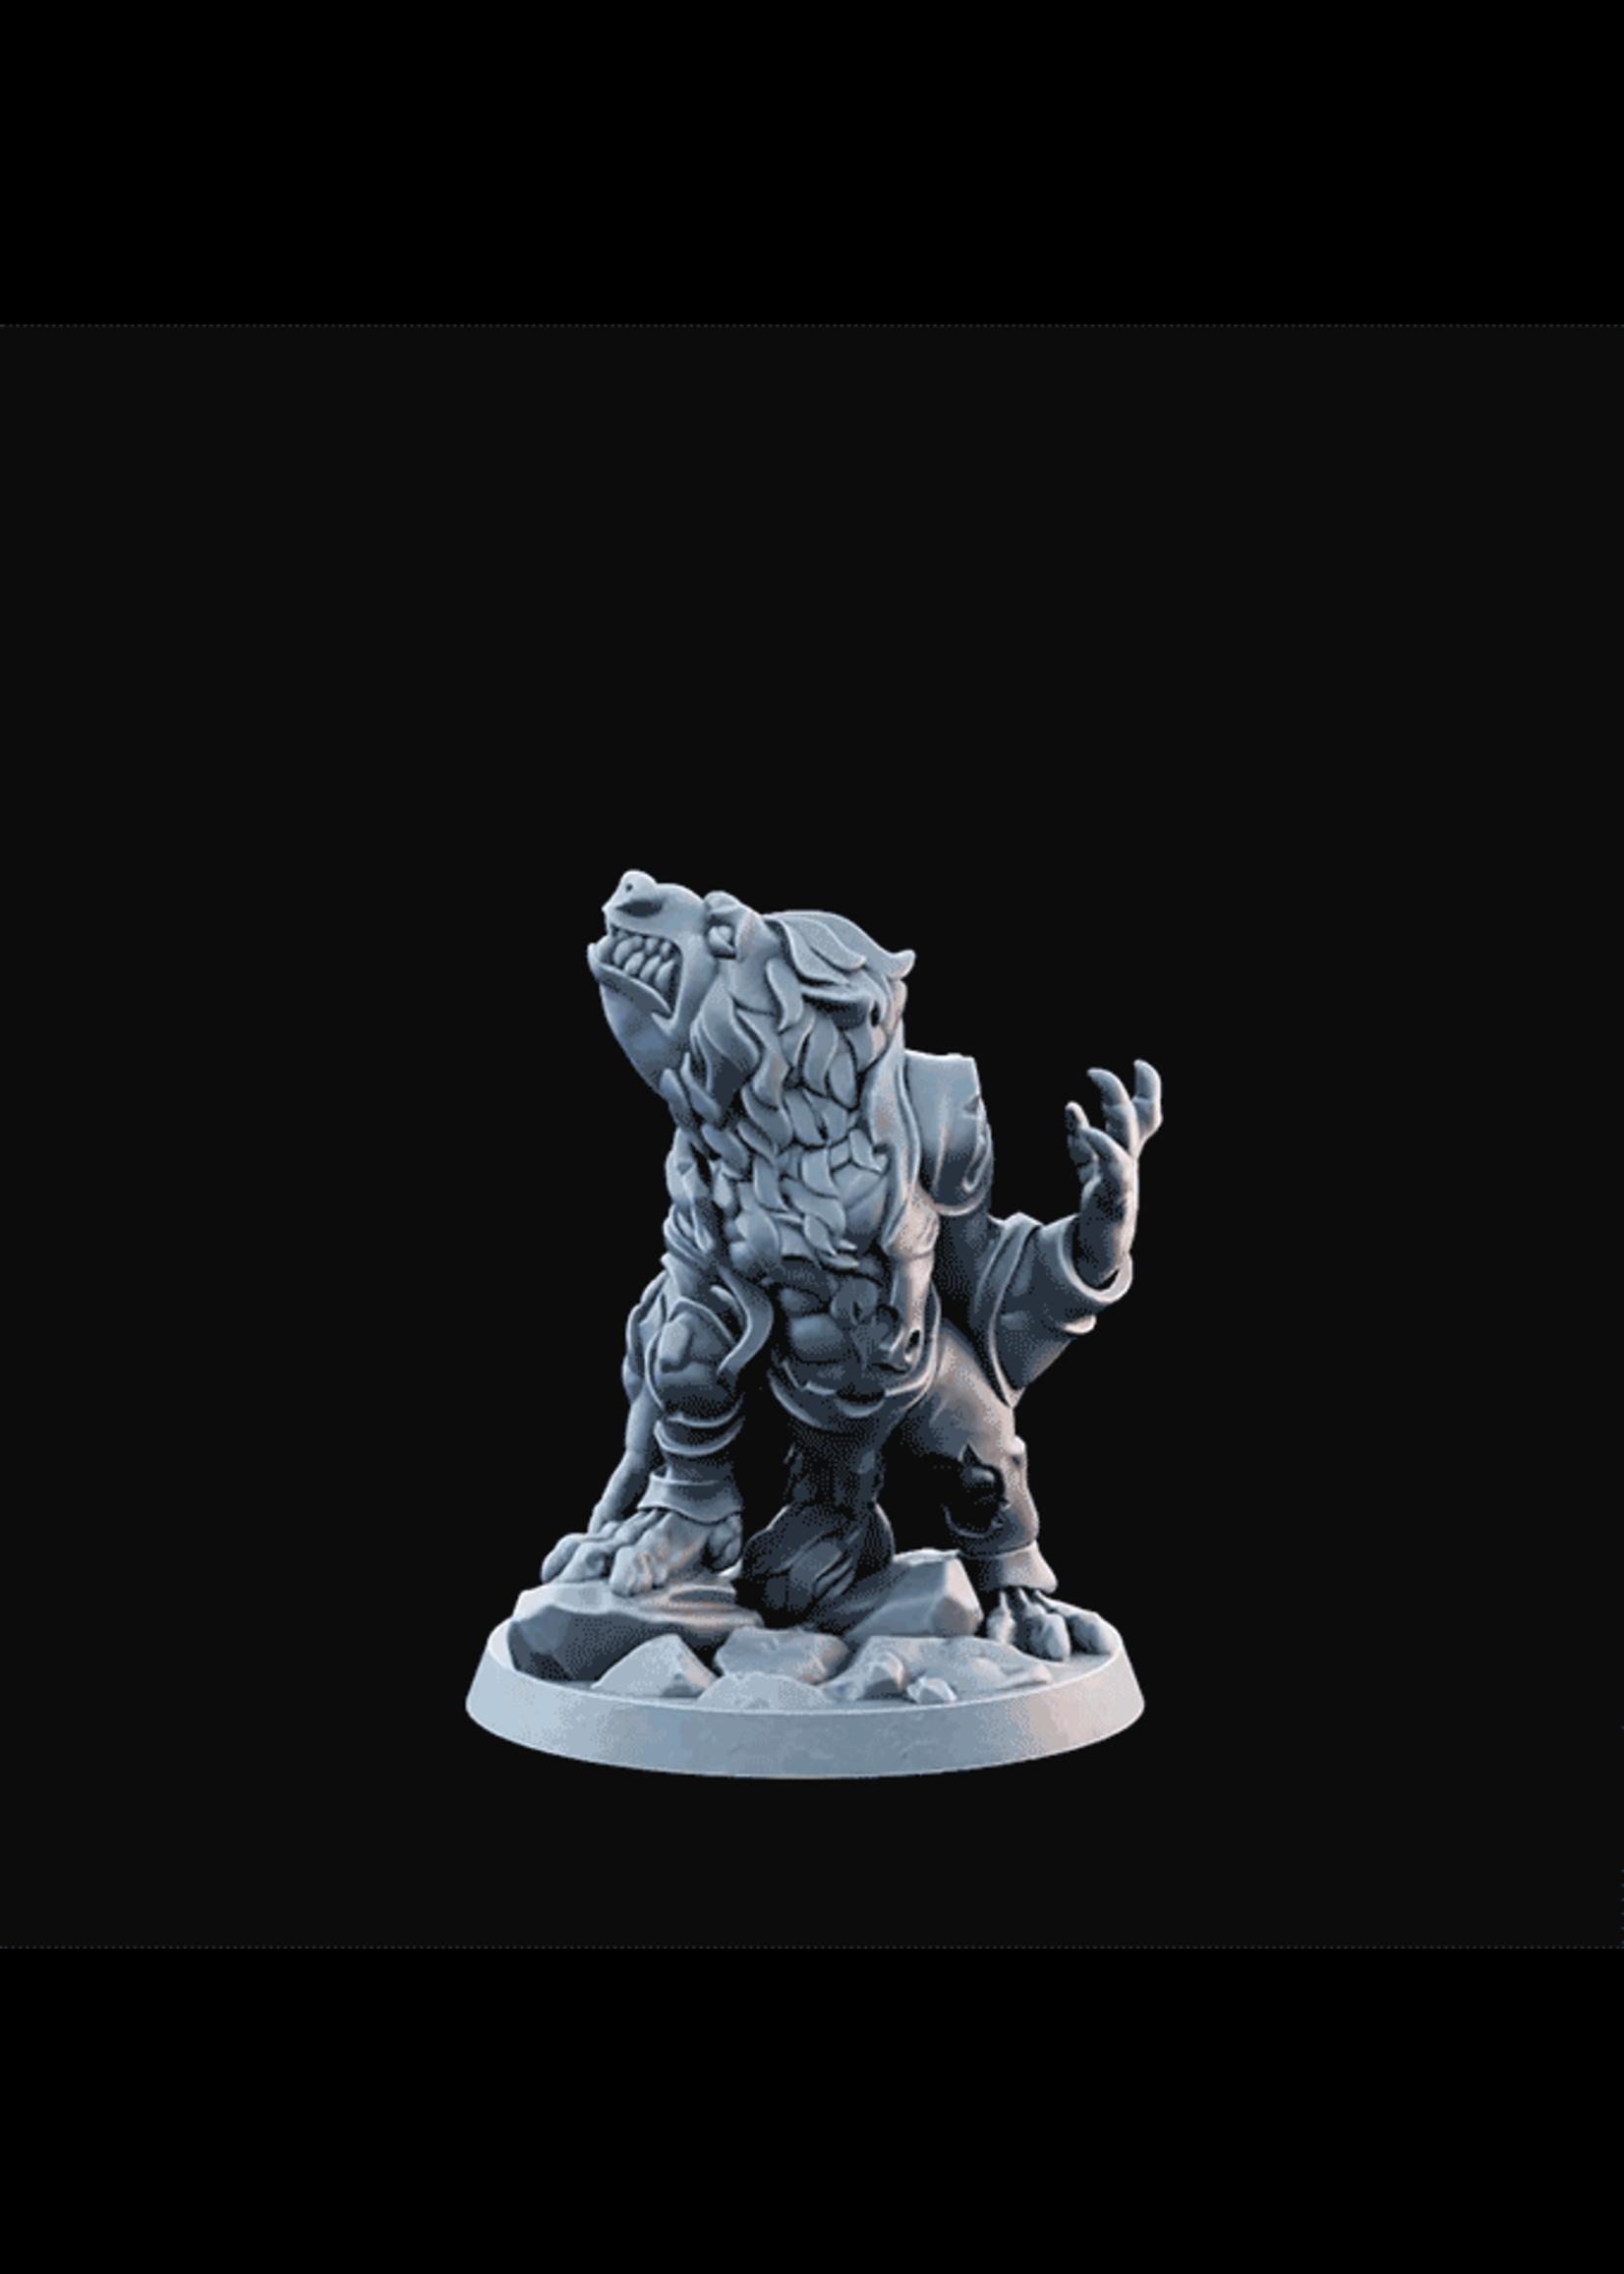 3D Printed Miniature - Wolfman03 Arms Low  - Dungeons & Dragons - Desolate Plains KS